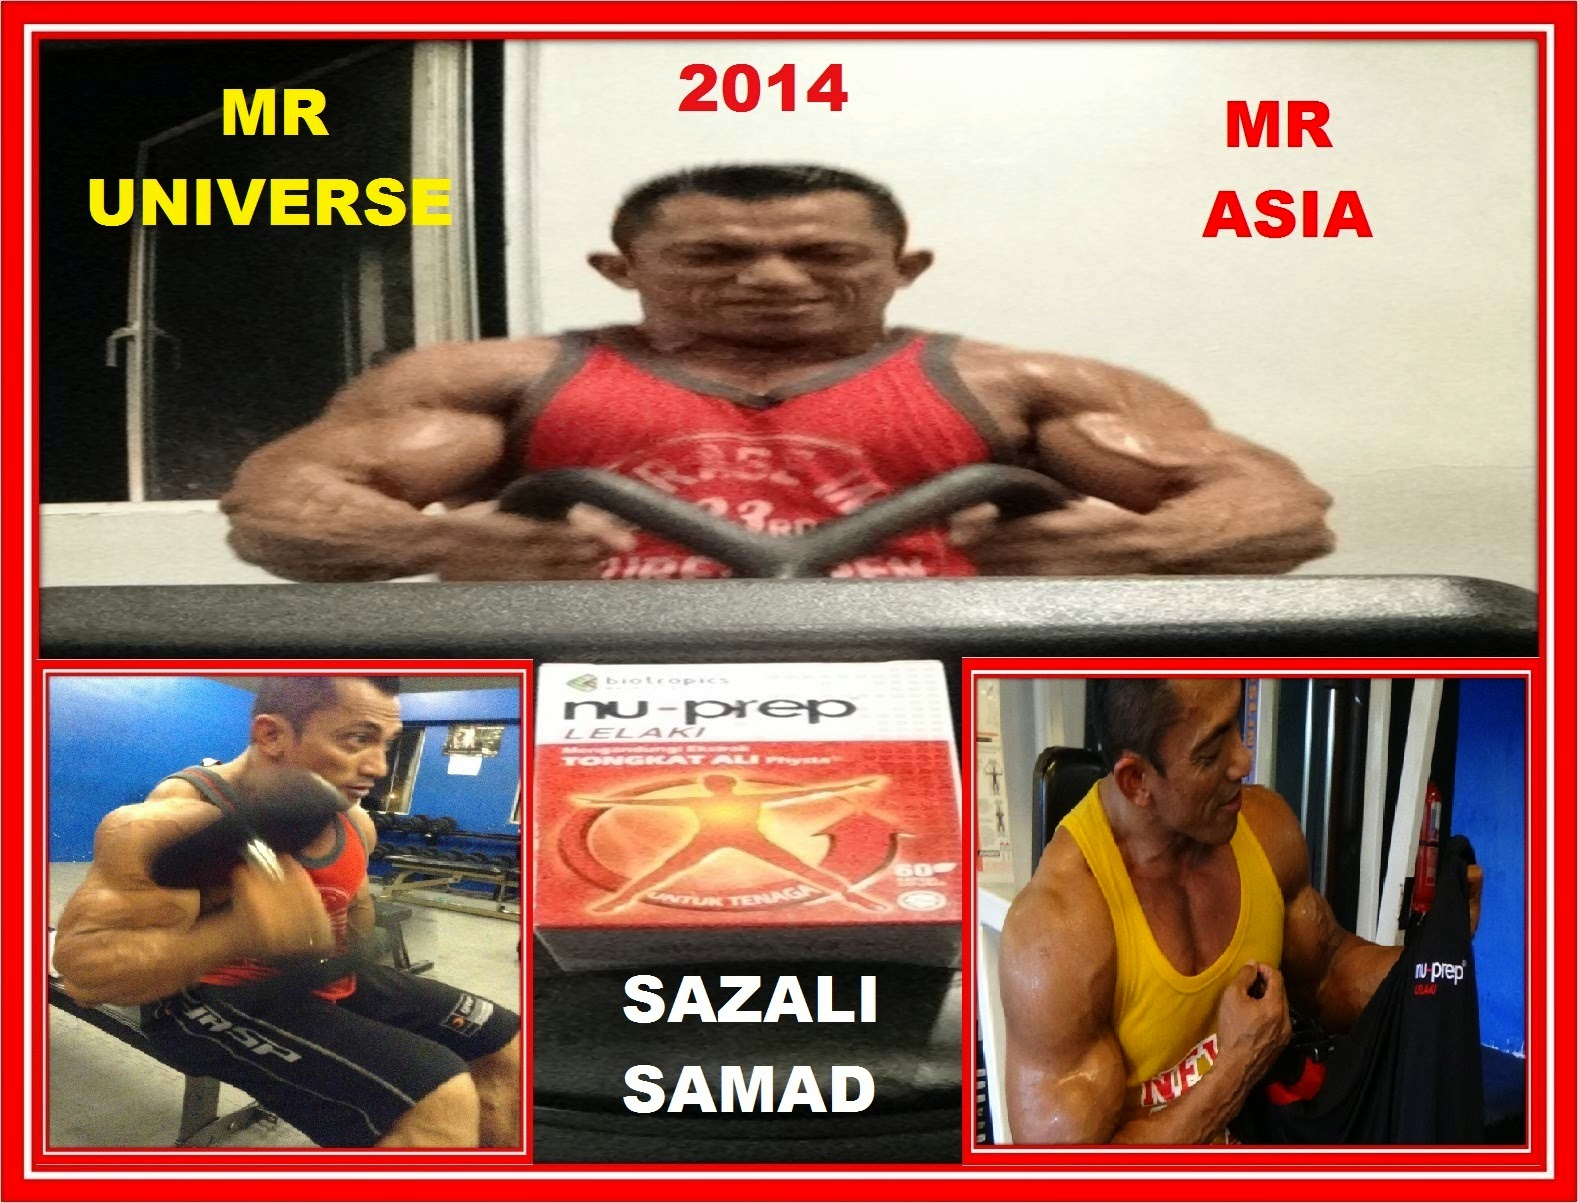 MR ASIA, MR UNIVERSE -SAZALI SAMAD 2014